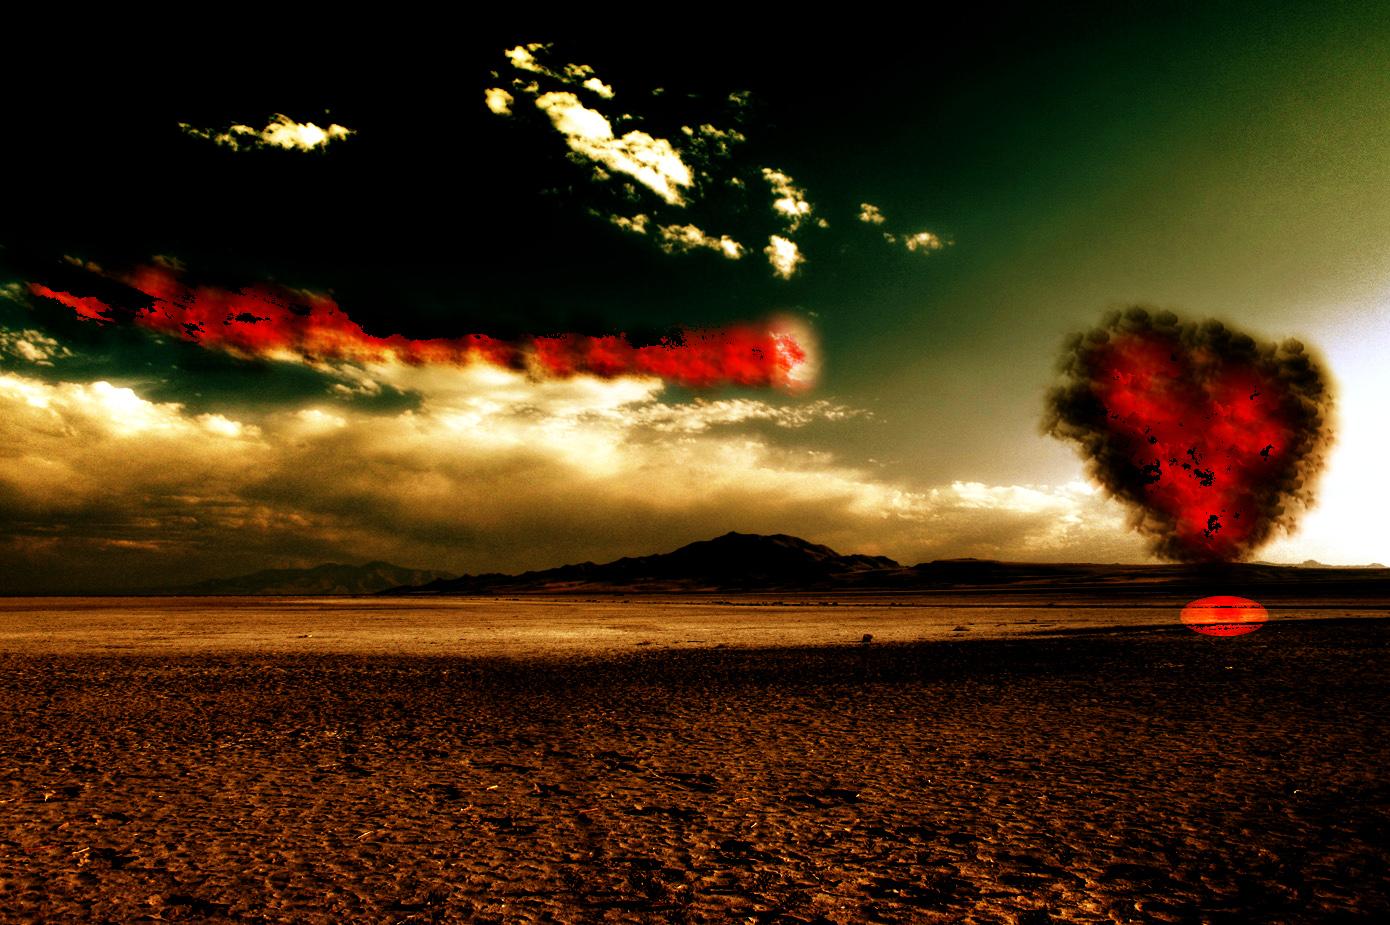 Explosion [GIMP]